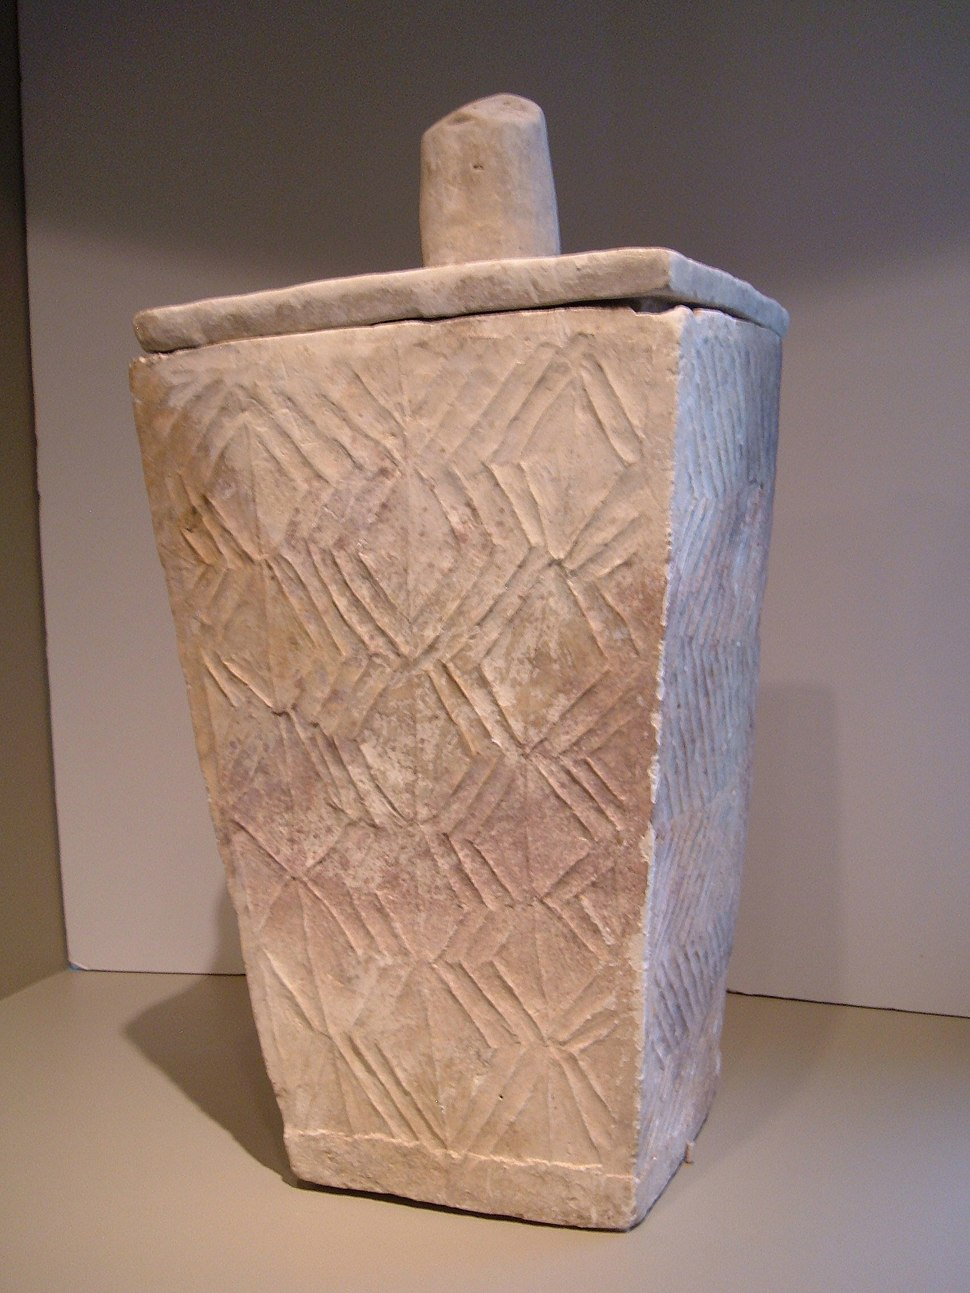 Mindanao burial urn 2 SF Asian Art Museum